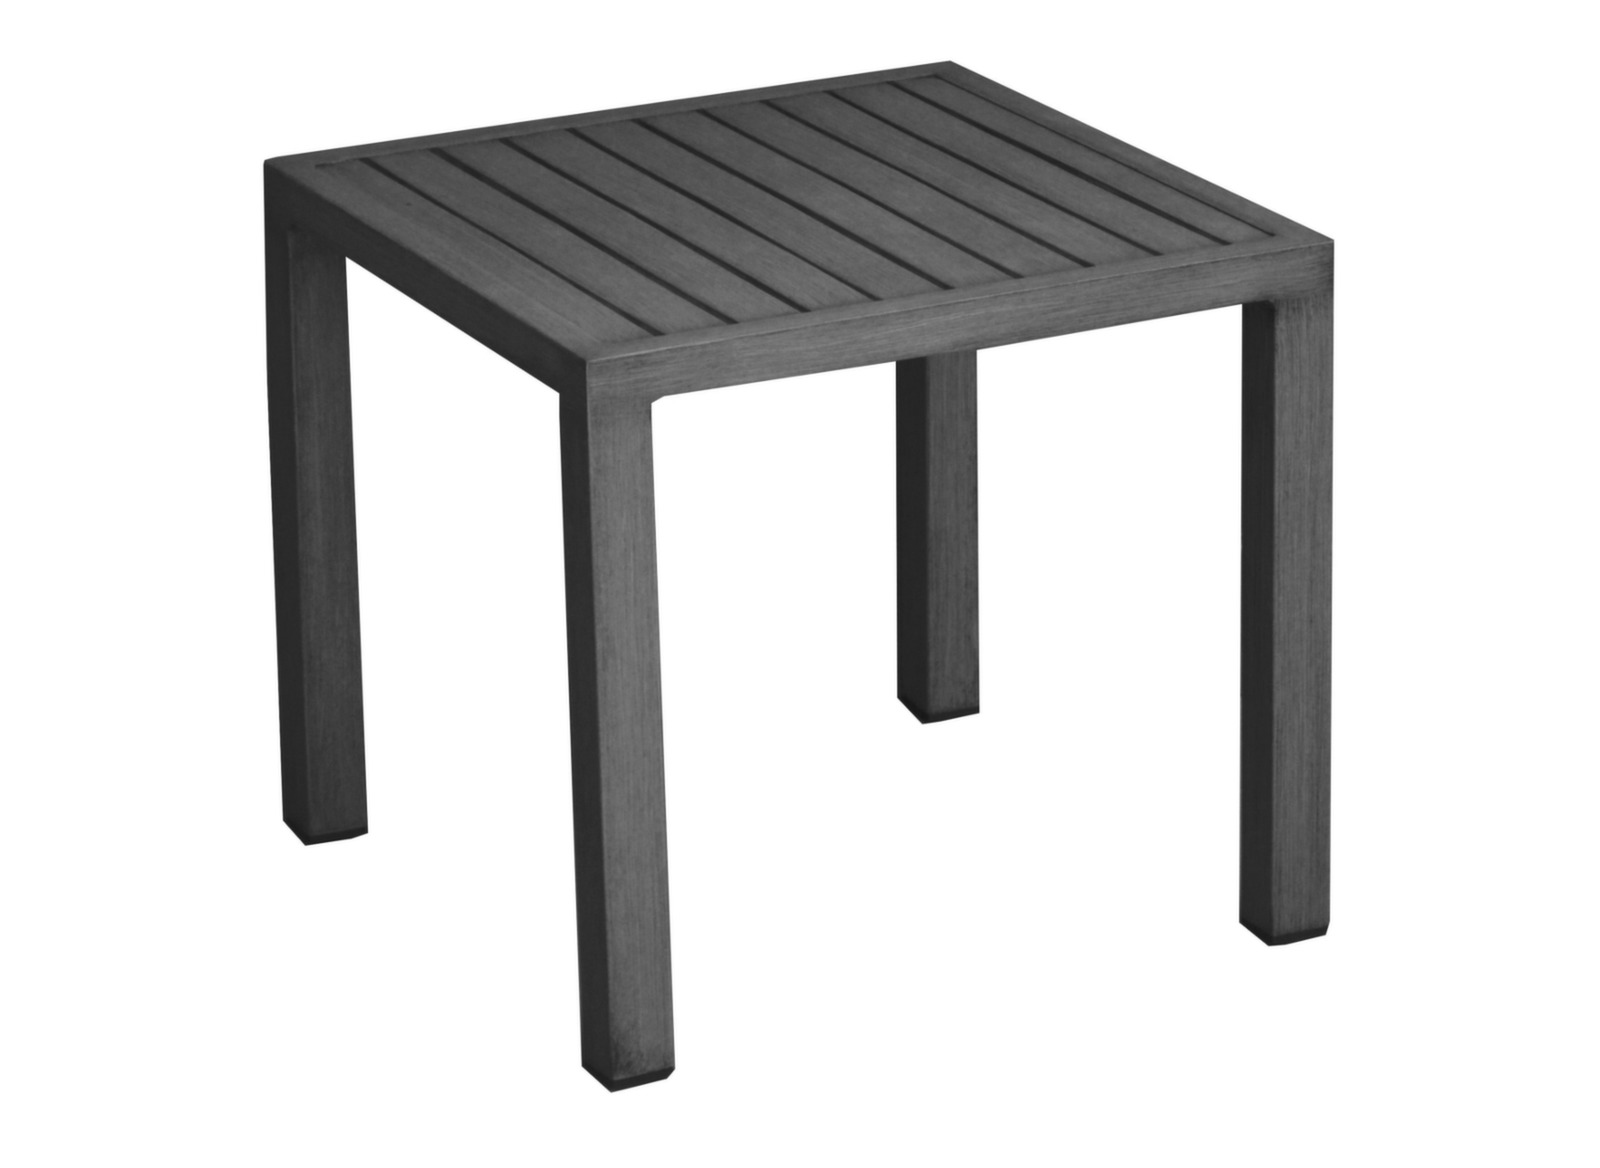 Table basse de jardin carr e lou proloisirs - Table jardin carree calais ...